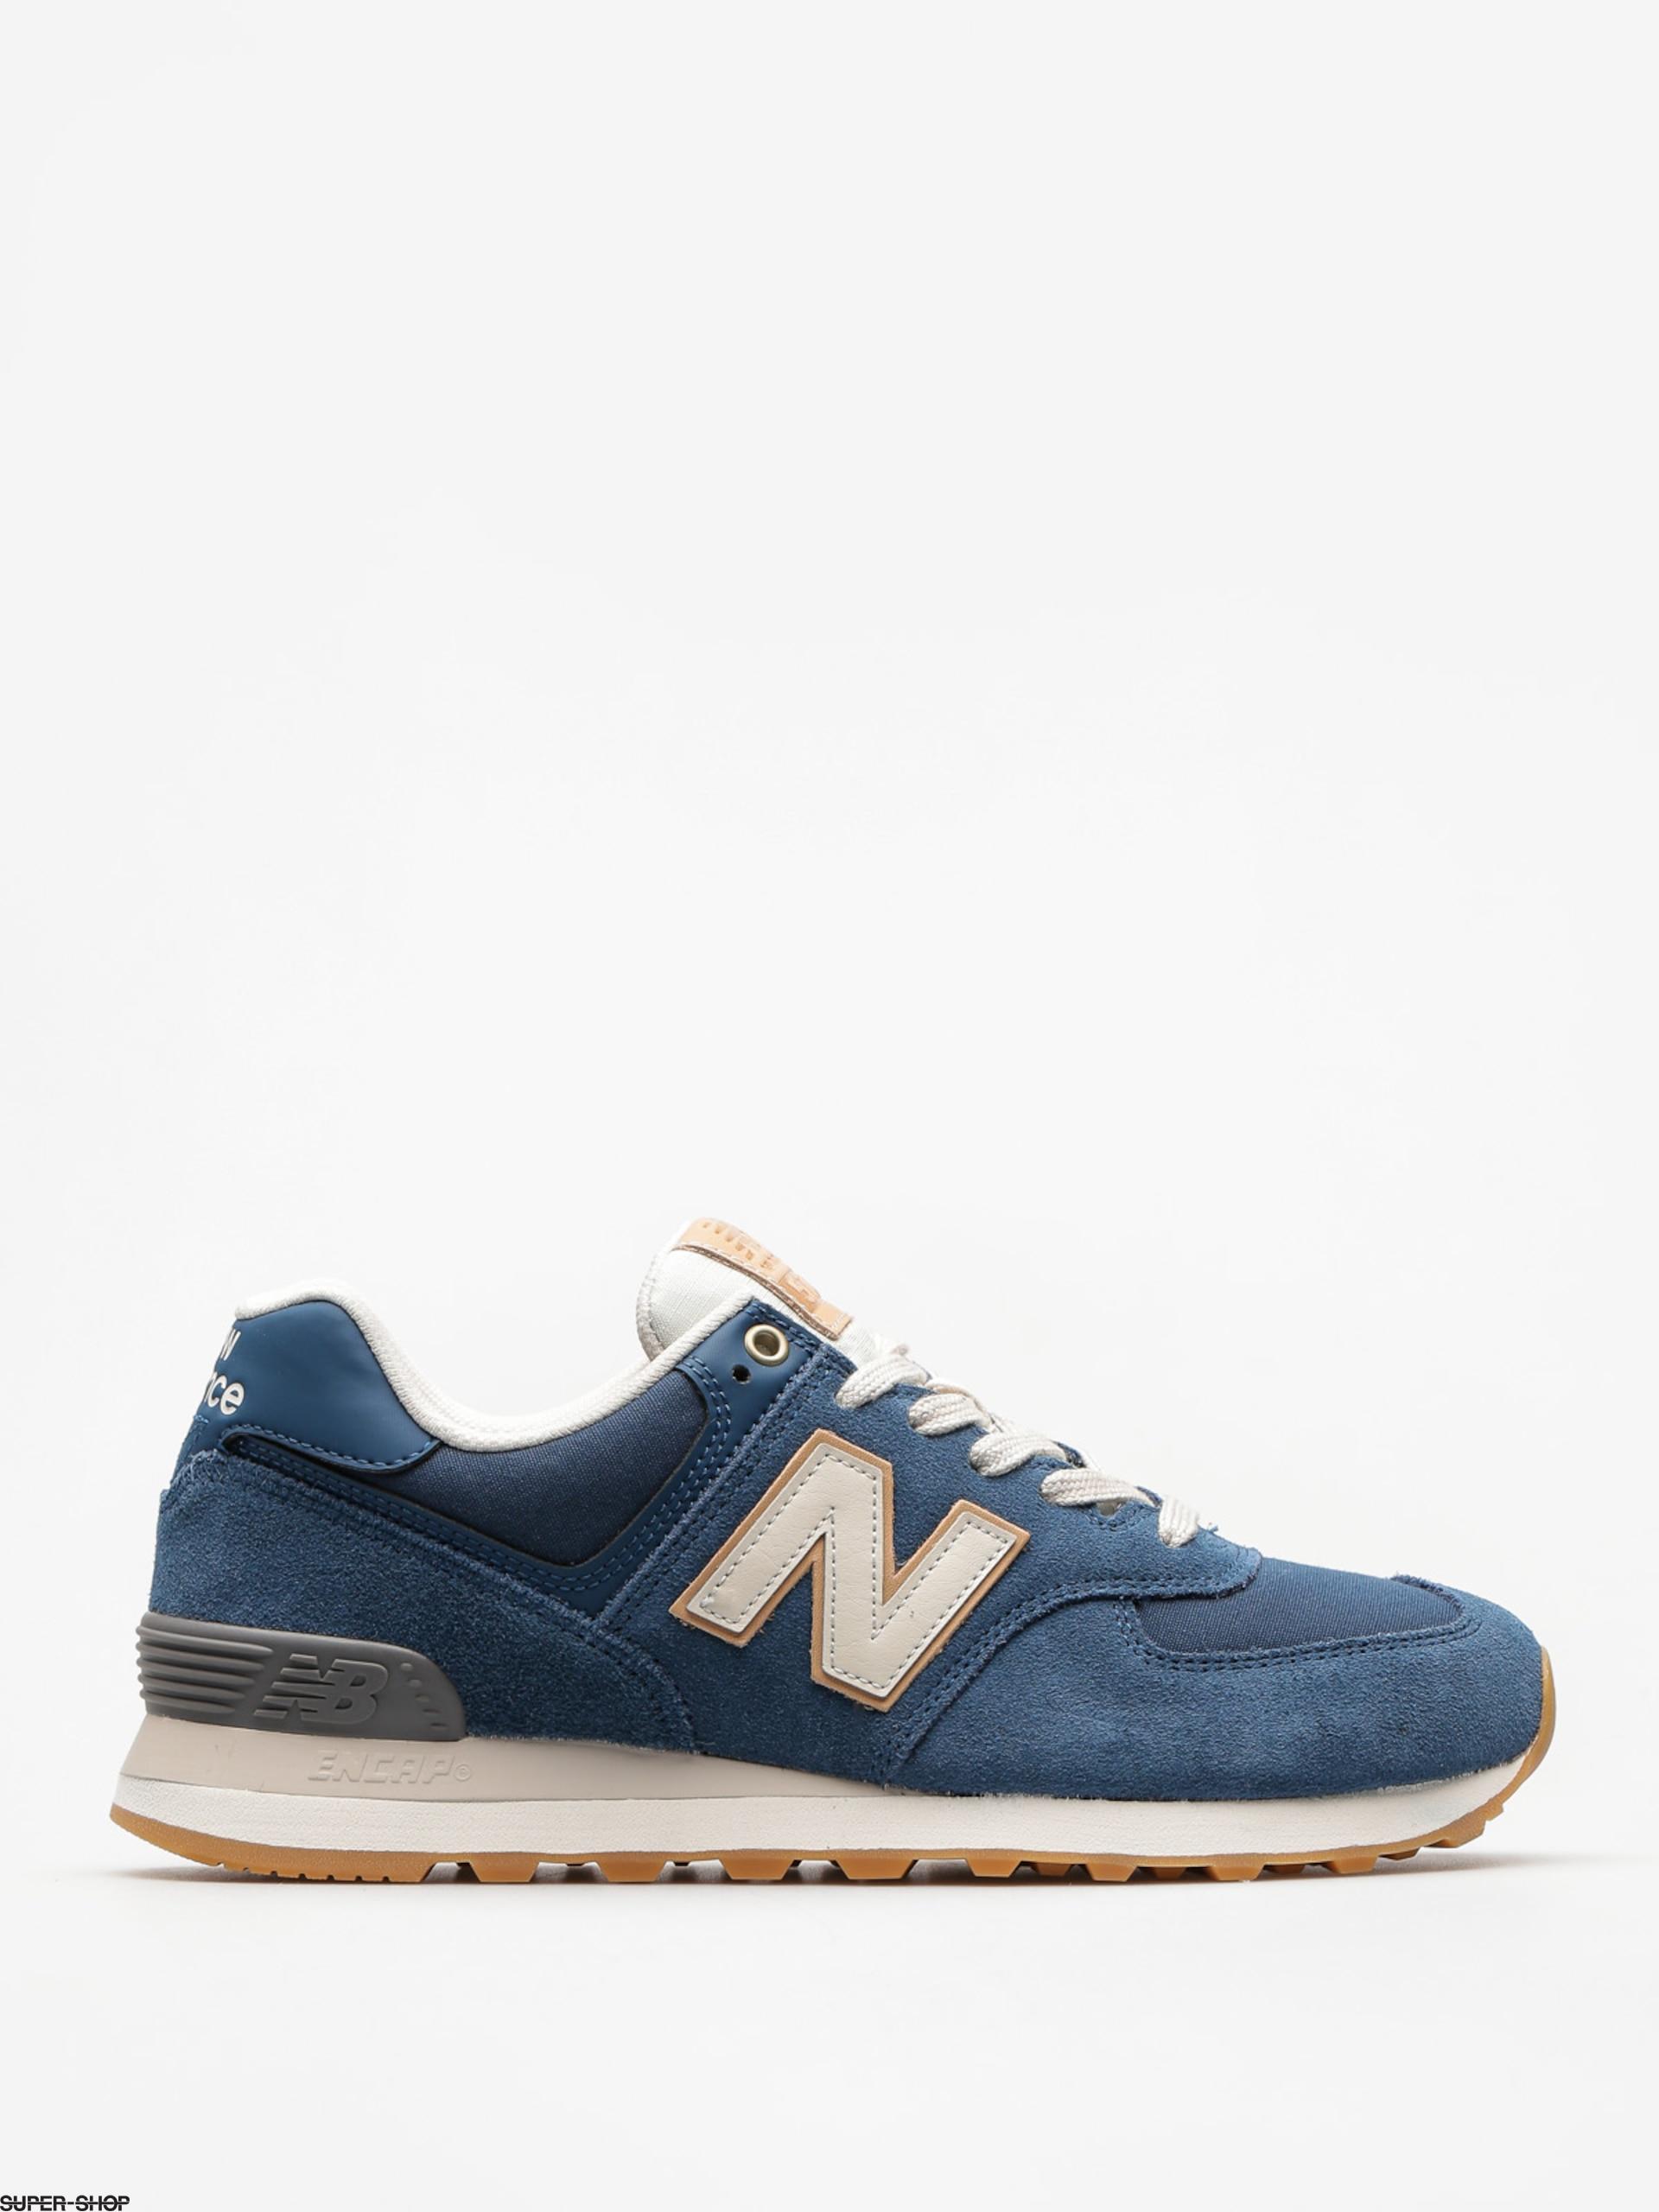 9e2aee2b54076 New Balance Shoes 574 (north/sea)